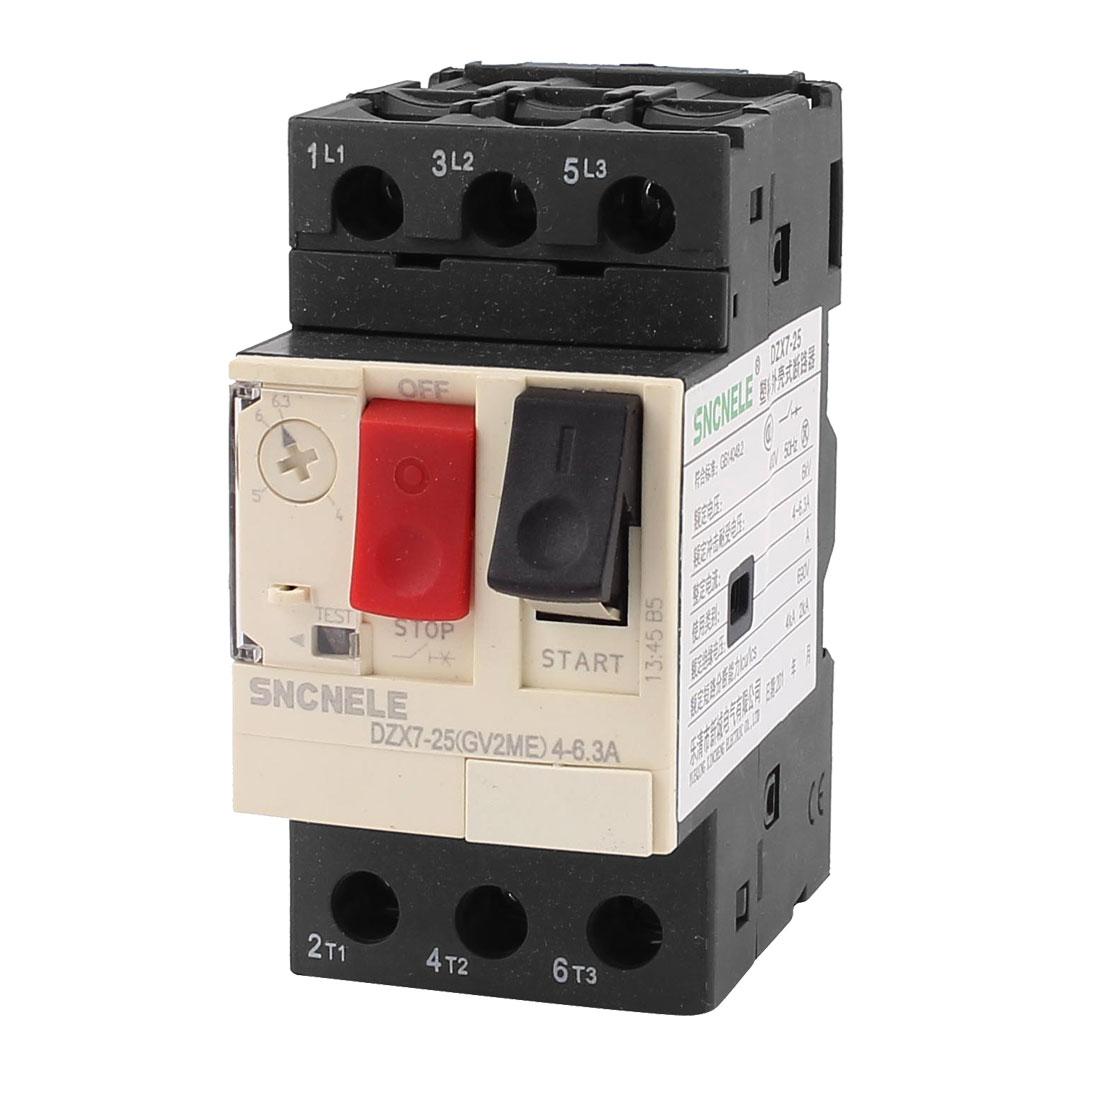 690V 6KV 4-6.3A 3 Phase Thermal Magnetic Motor Protection Circuit Breaker